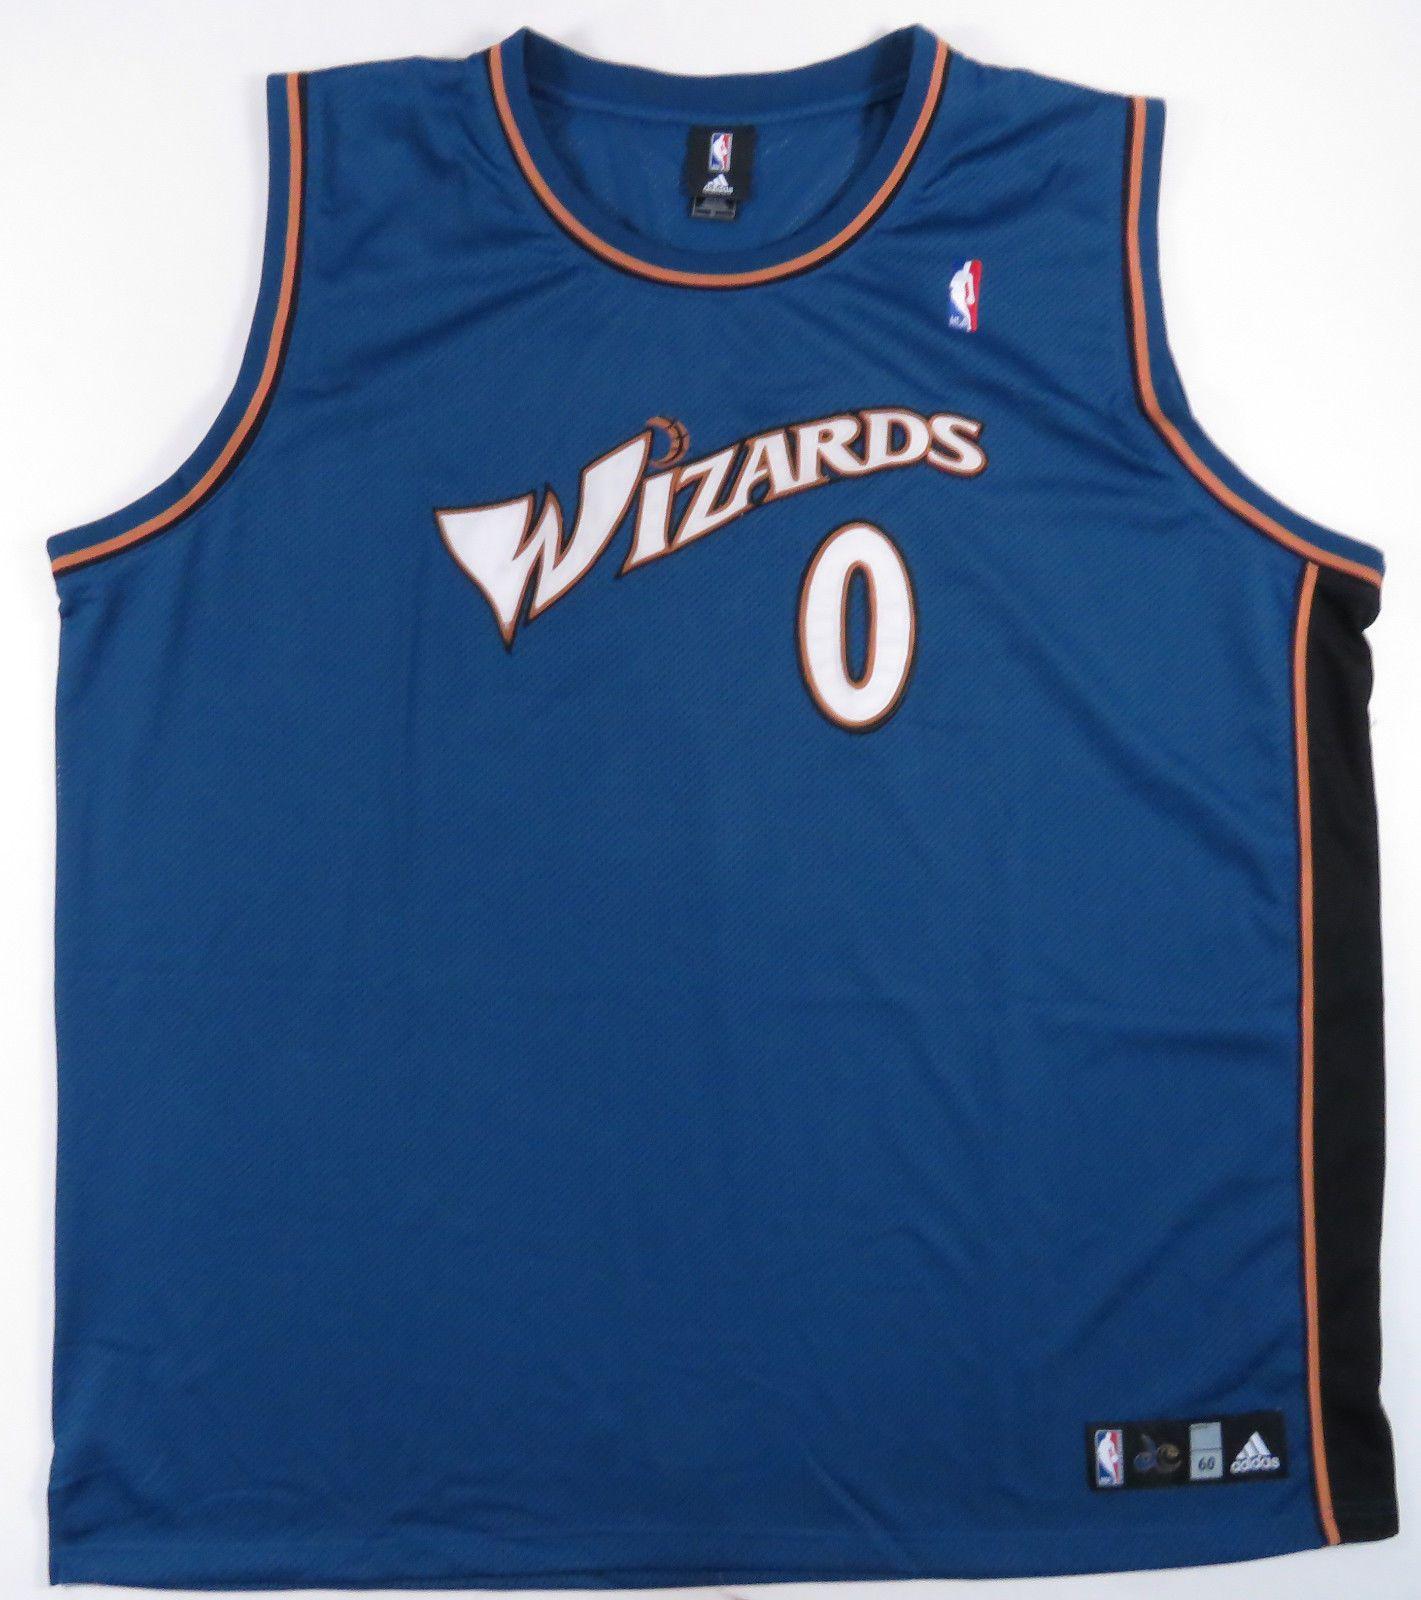 e080f684c GILBERT ARENAS WASHINGTON WIZARDS SEWN ADIDAS BASKETBALL JERSEY NBA 60  VINTAGE (eBay Link)